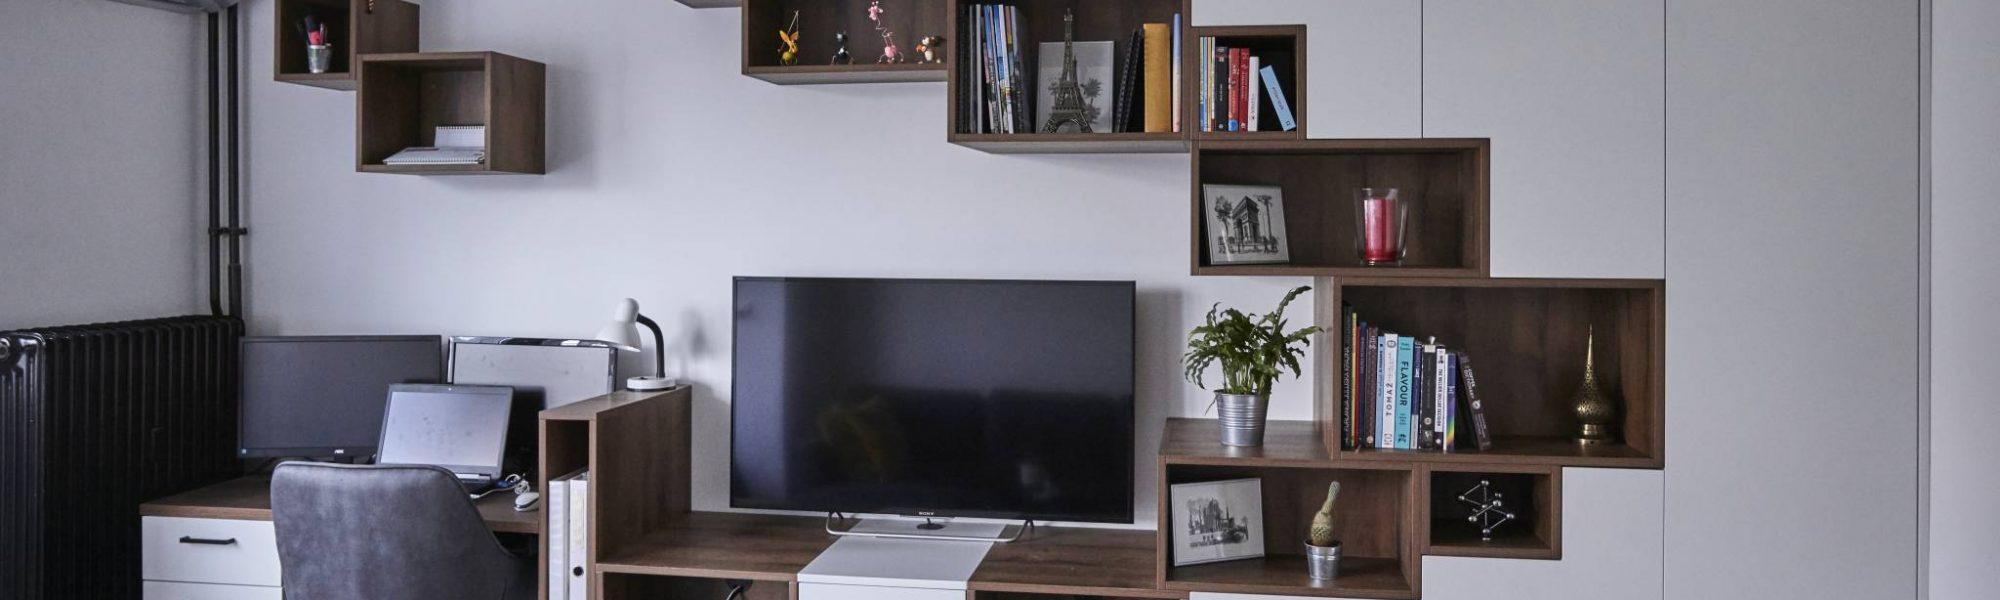 Pohištvo po meri kubus (4)